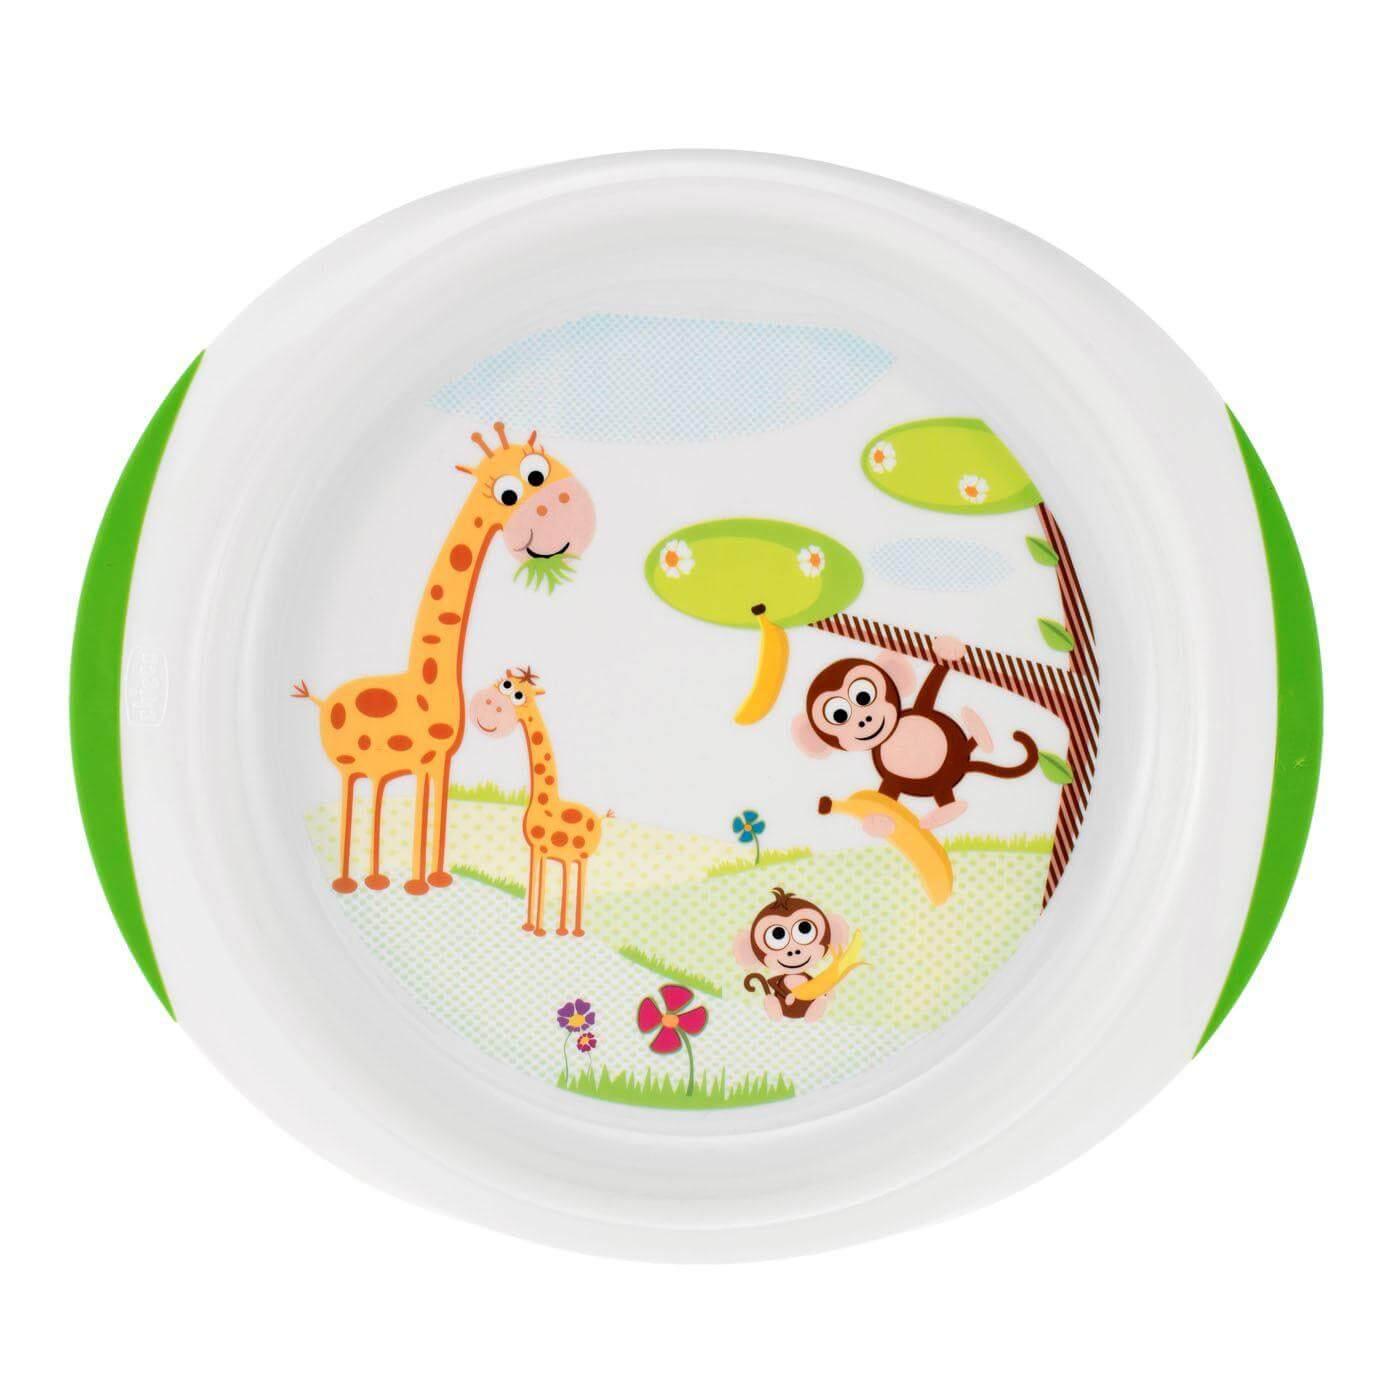 Chicco Σετ Πιάτων Φαγητού 12m+ (2 τμχ , 1 βαθύ και ένα ρηχό)